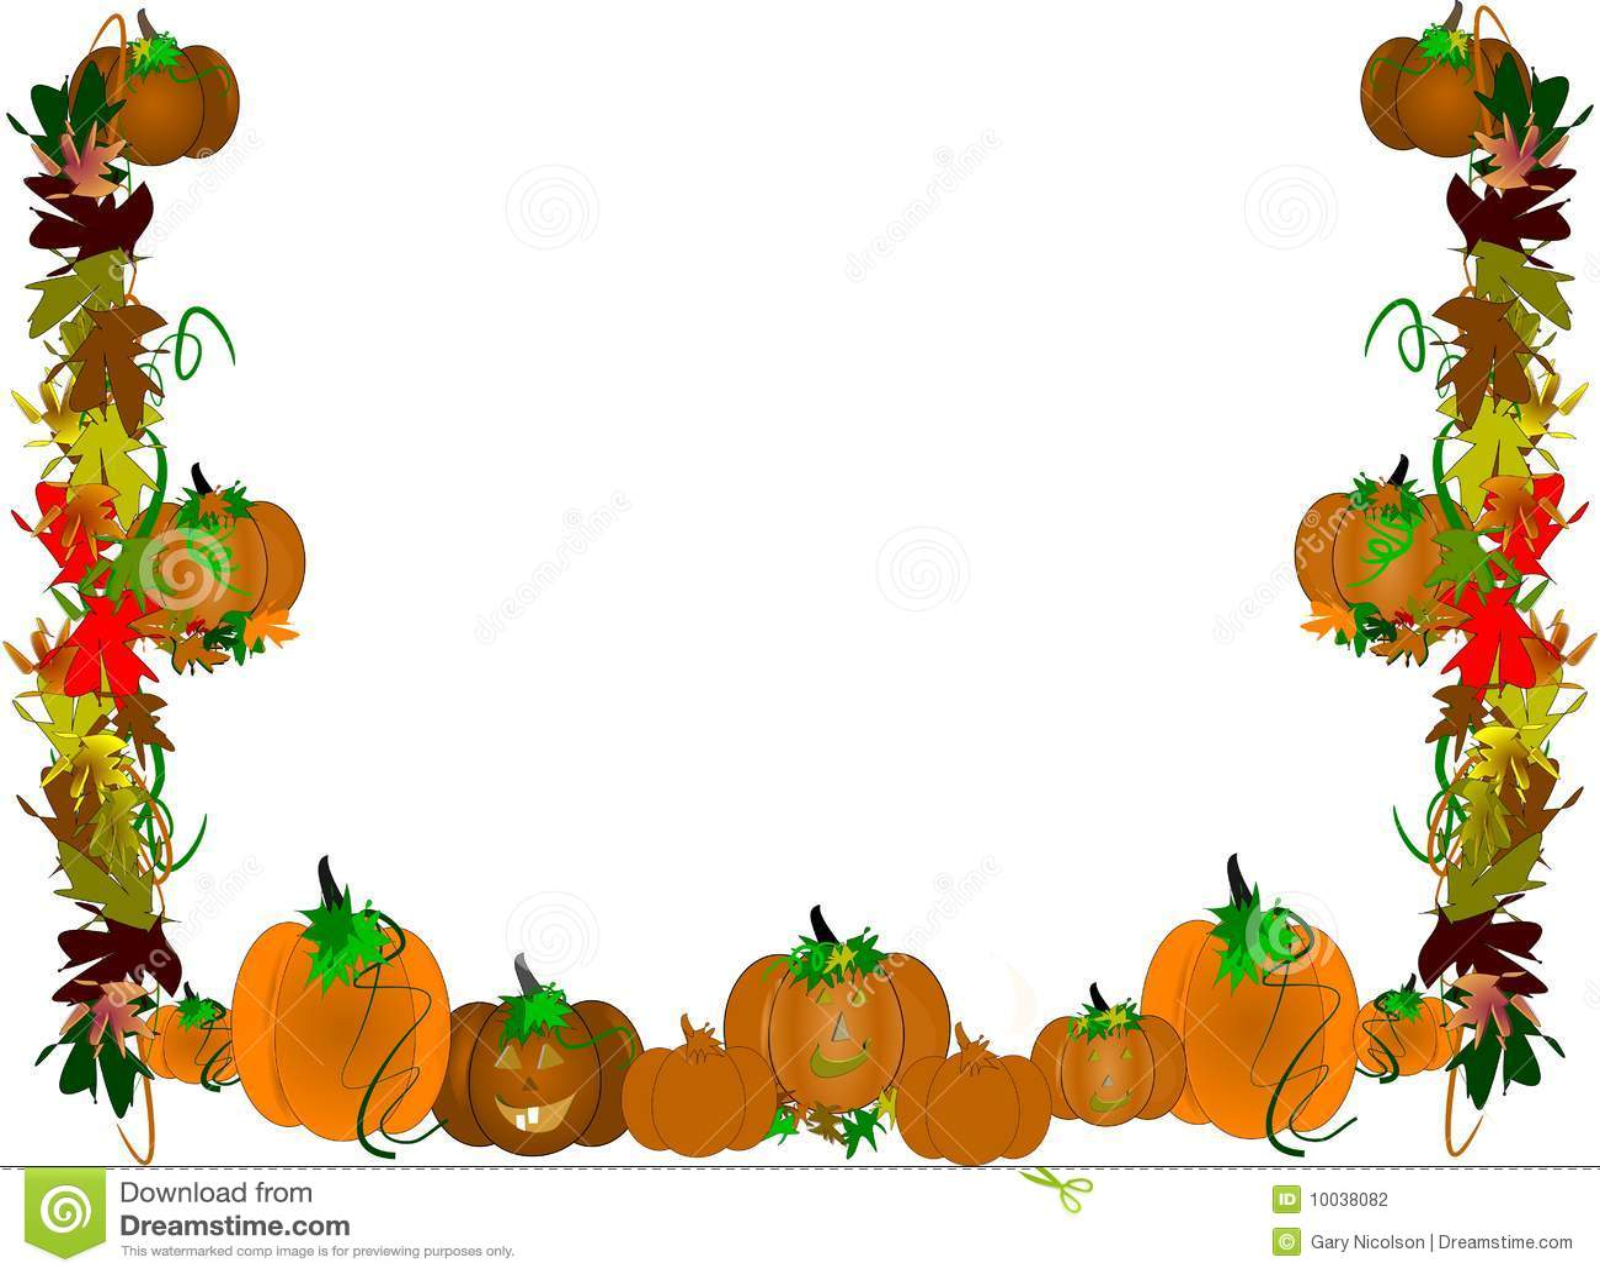 Vine border clip art 298 x 279 16 6Kb Pumpkin patch border 1300 x 1053